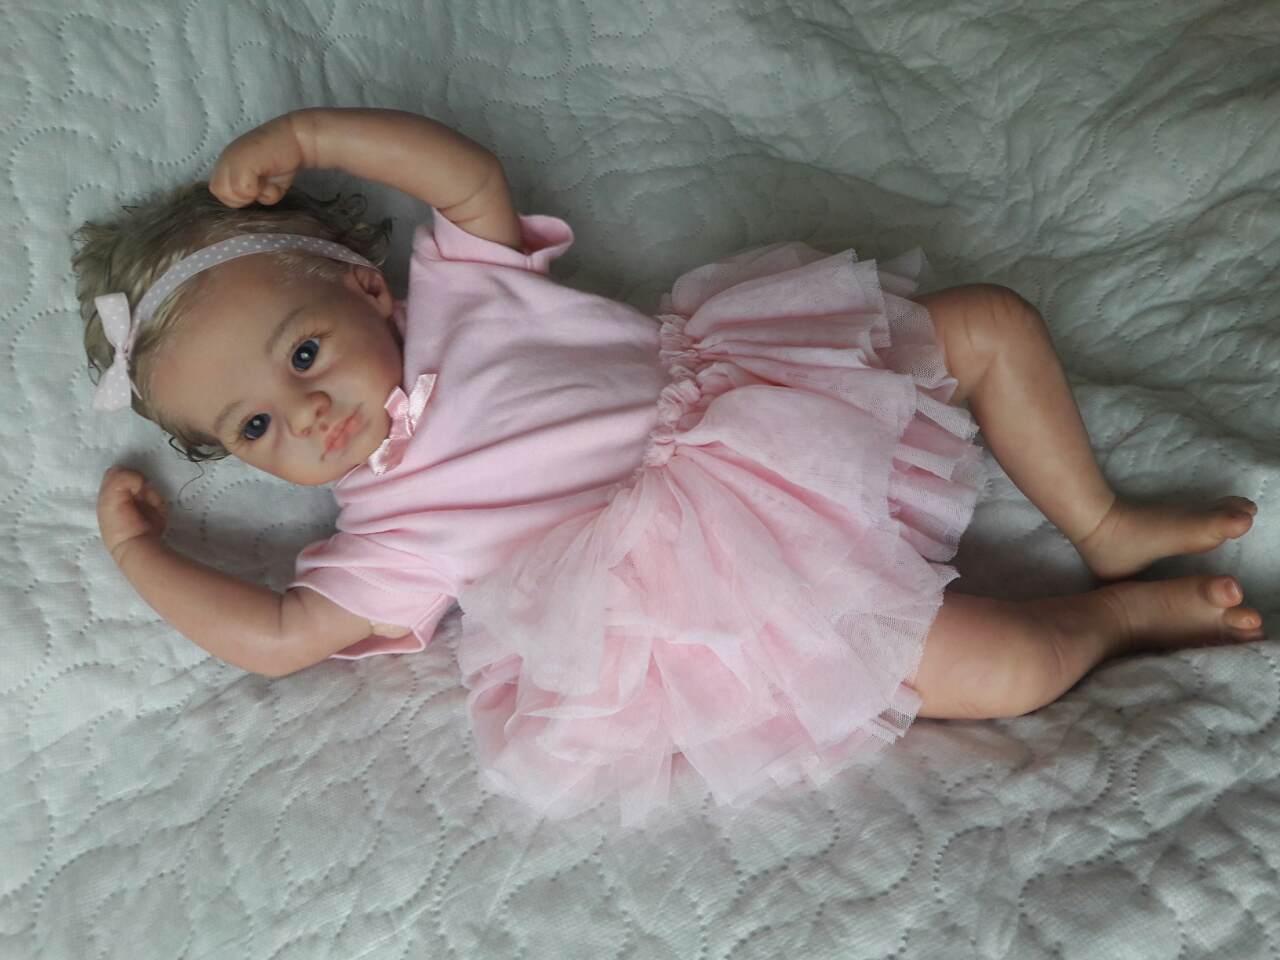 Кукла реборн Эмилия.Reborn doll.Кукла ручная работа.